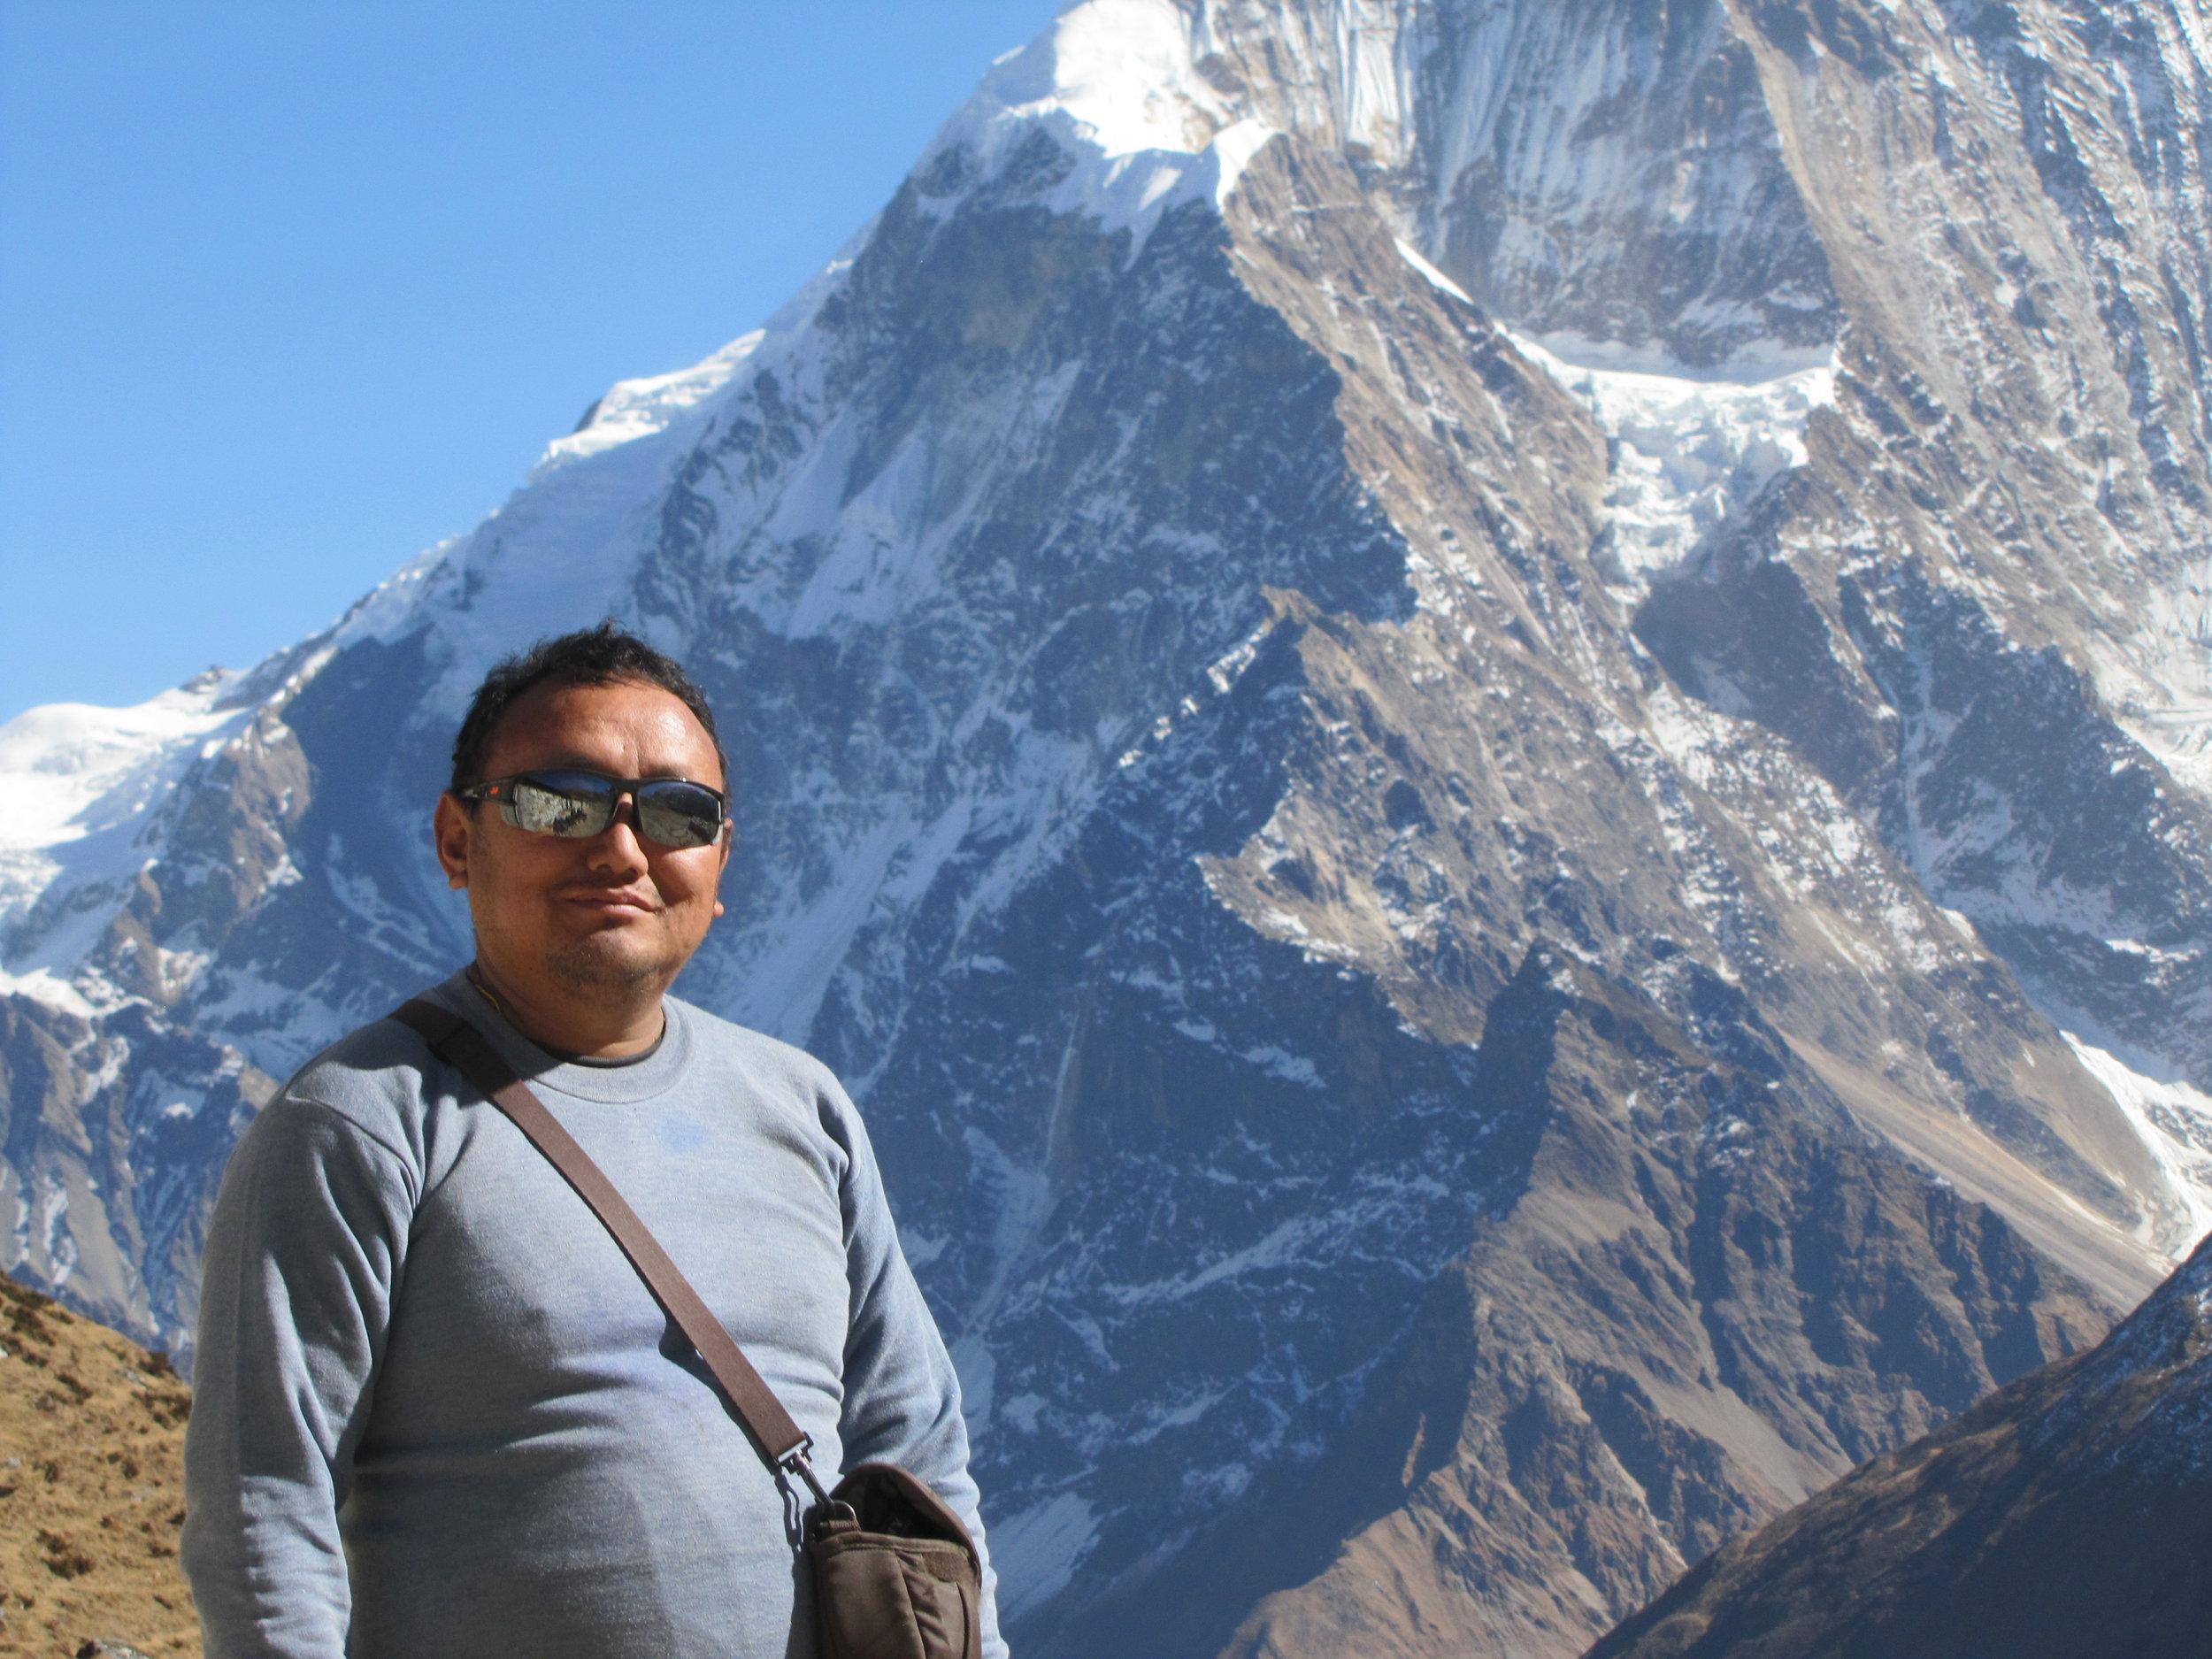 Furba Sherpa- Nepal trekking guide expert